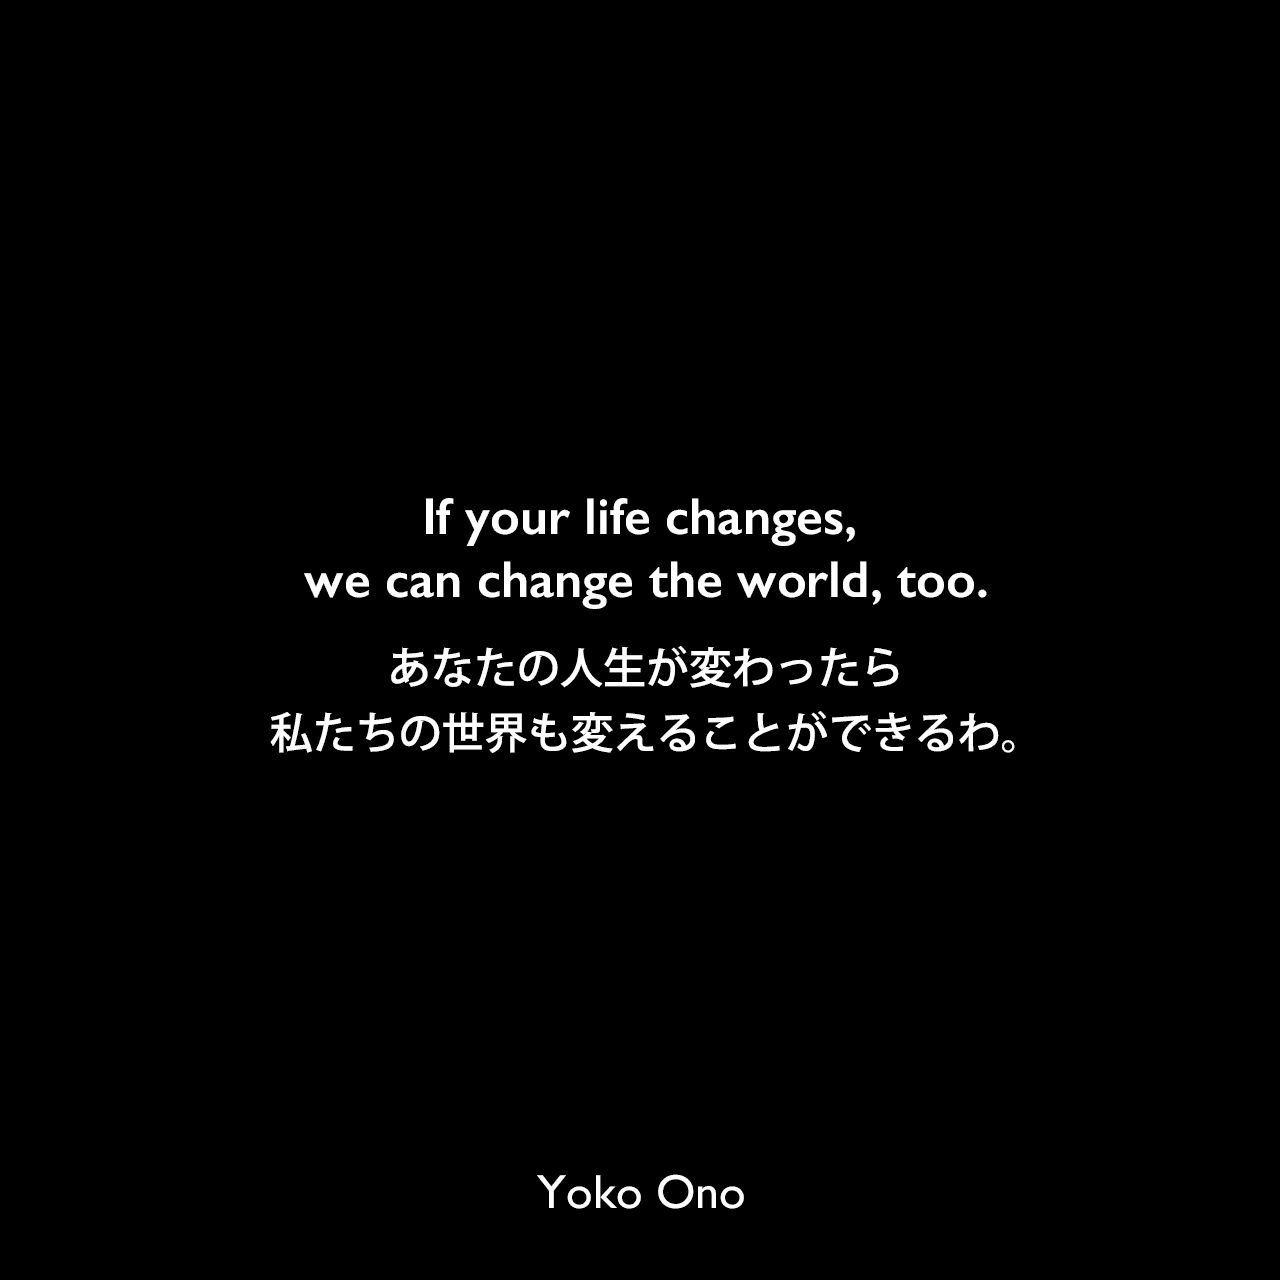 If your life changes, we can change the world, too.あなたの人生が変わったら、私たちの世界も変えることができるわ。